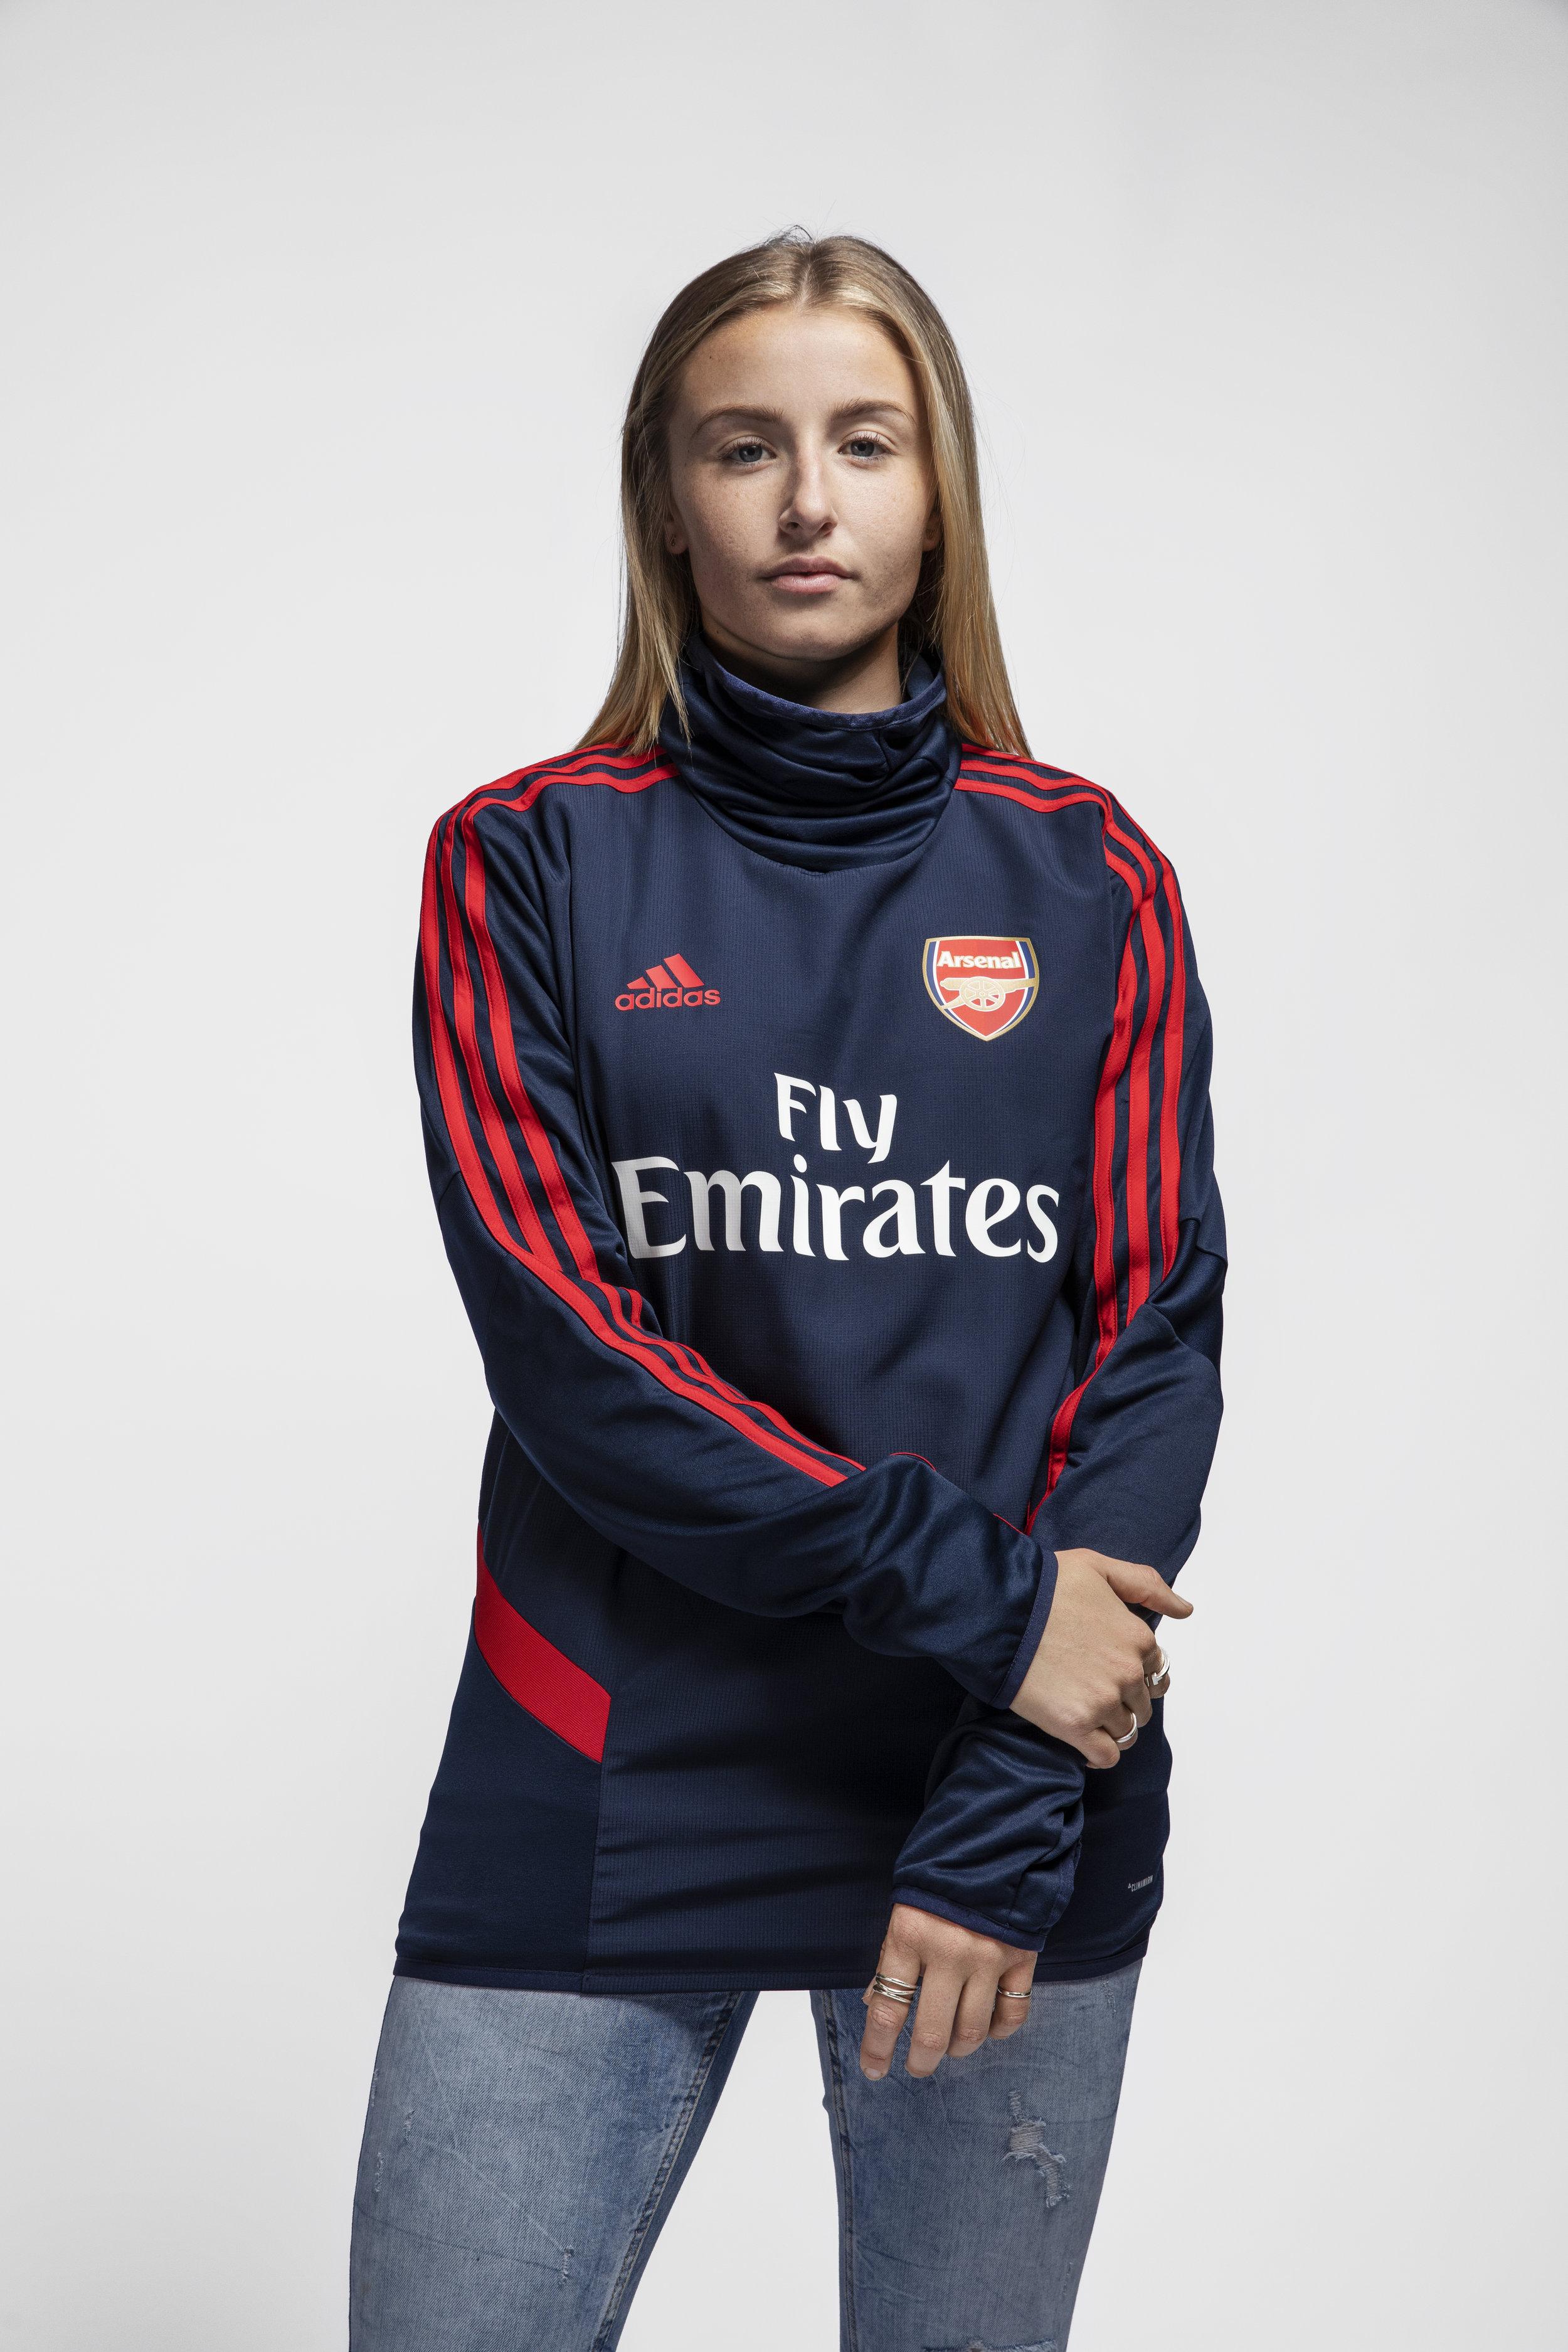 Arsenal Adidas Edited Leah Williamson.jpg